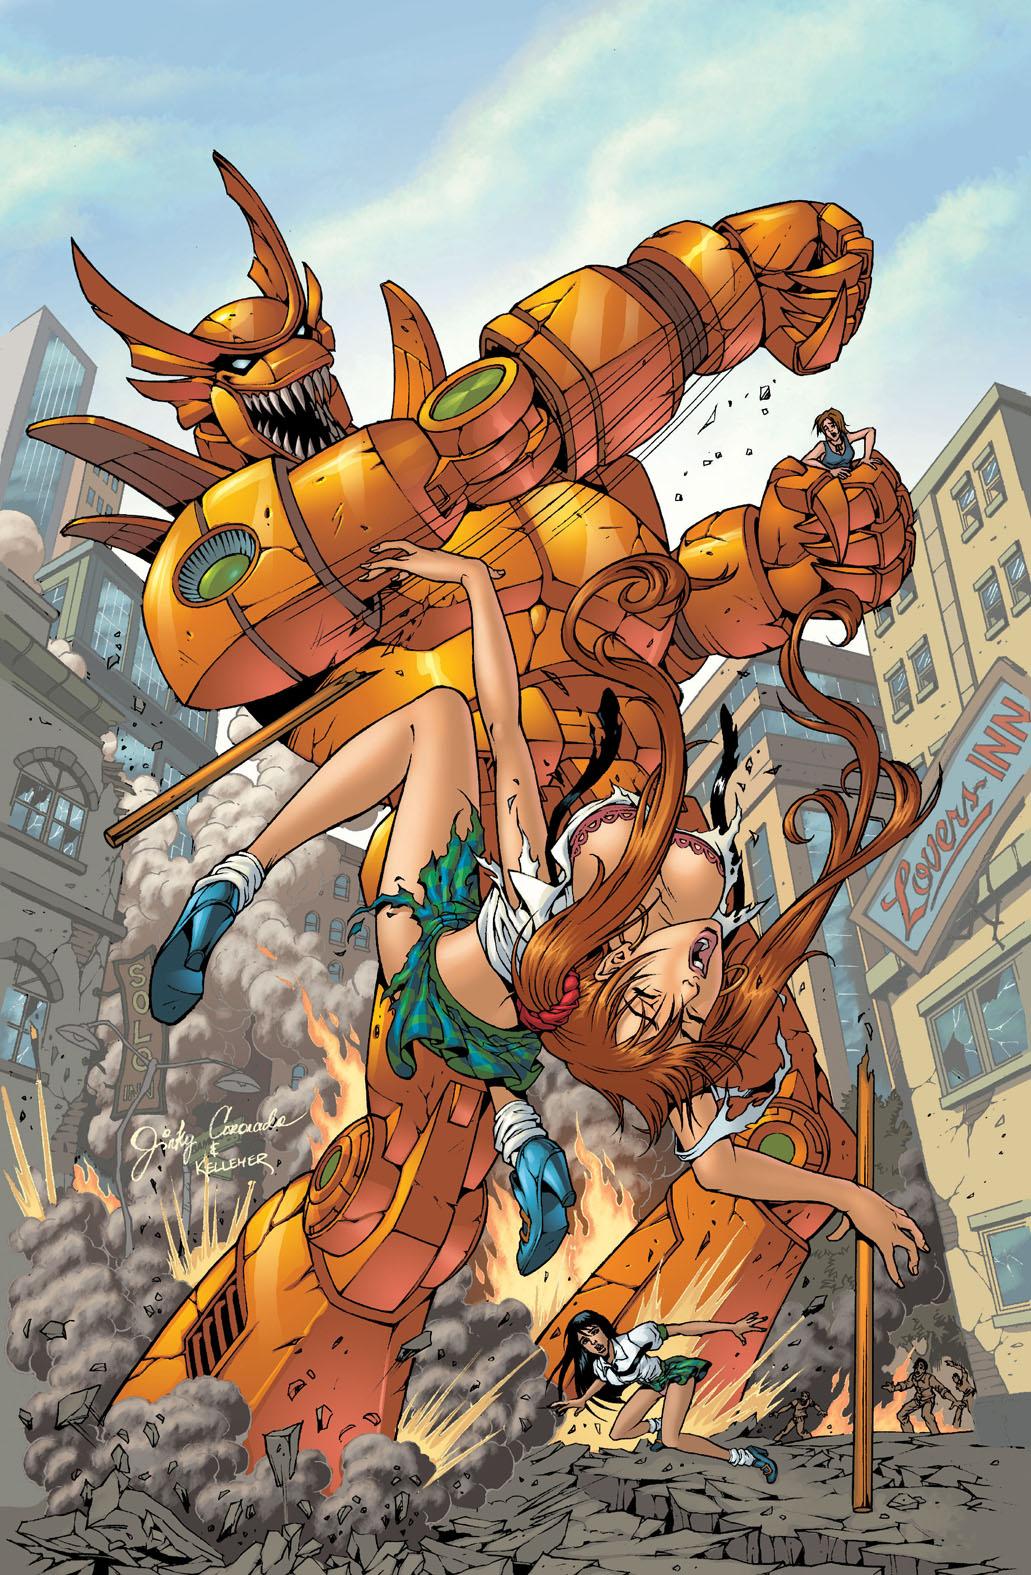 BANZAI GIRL: AYE, ROBOT!